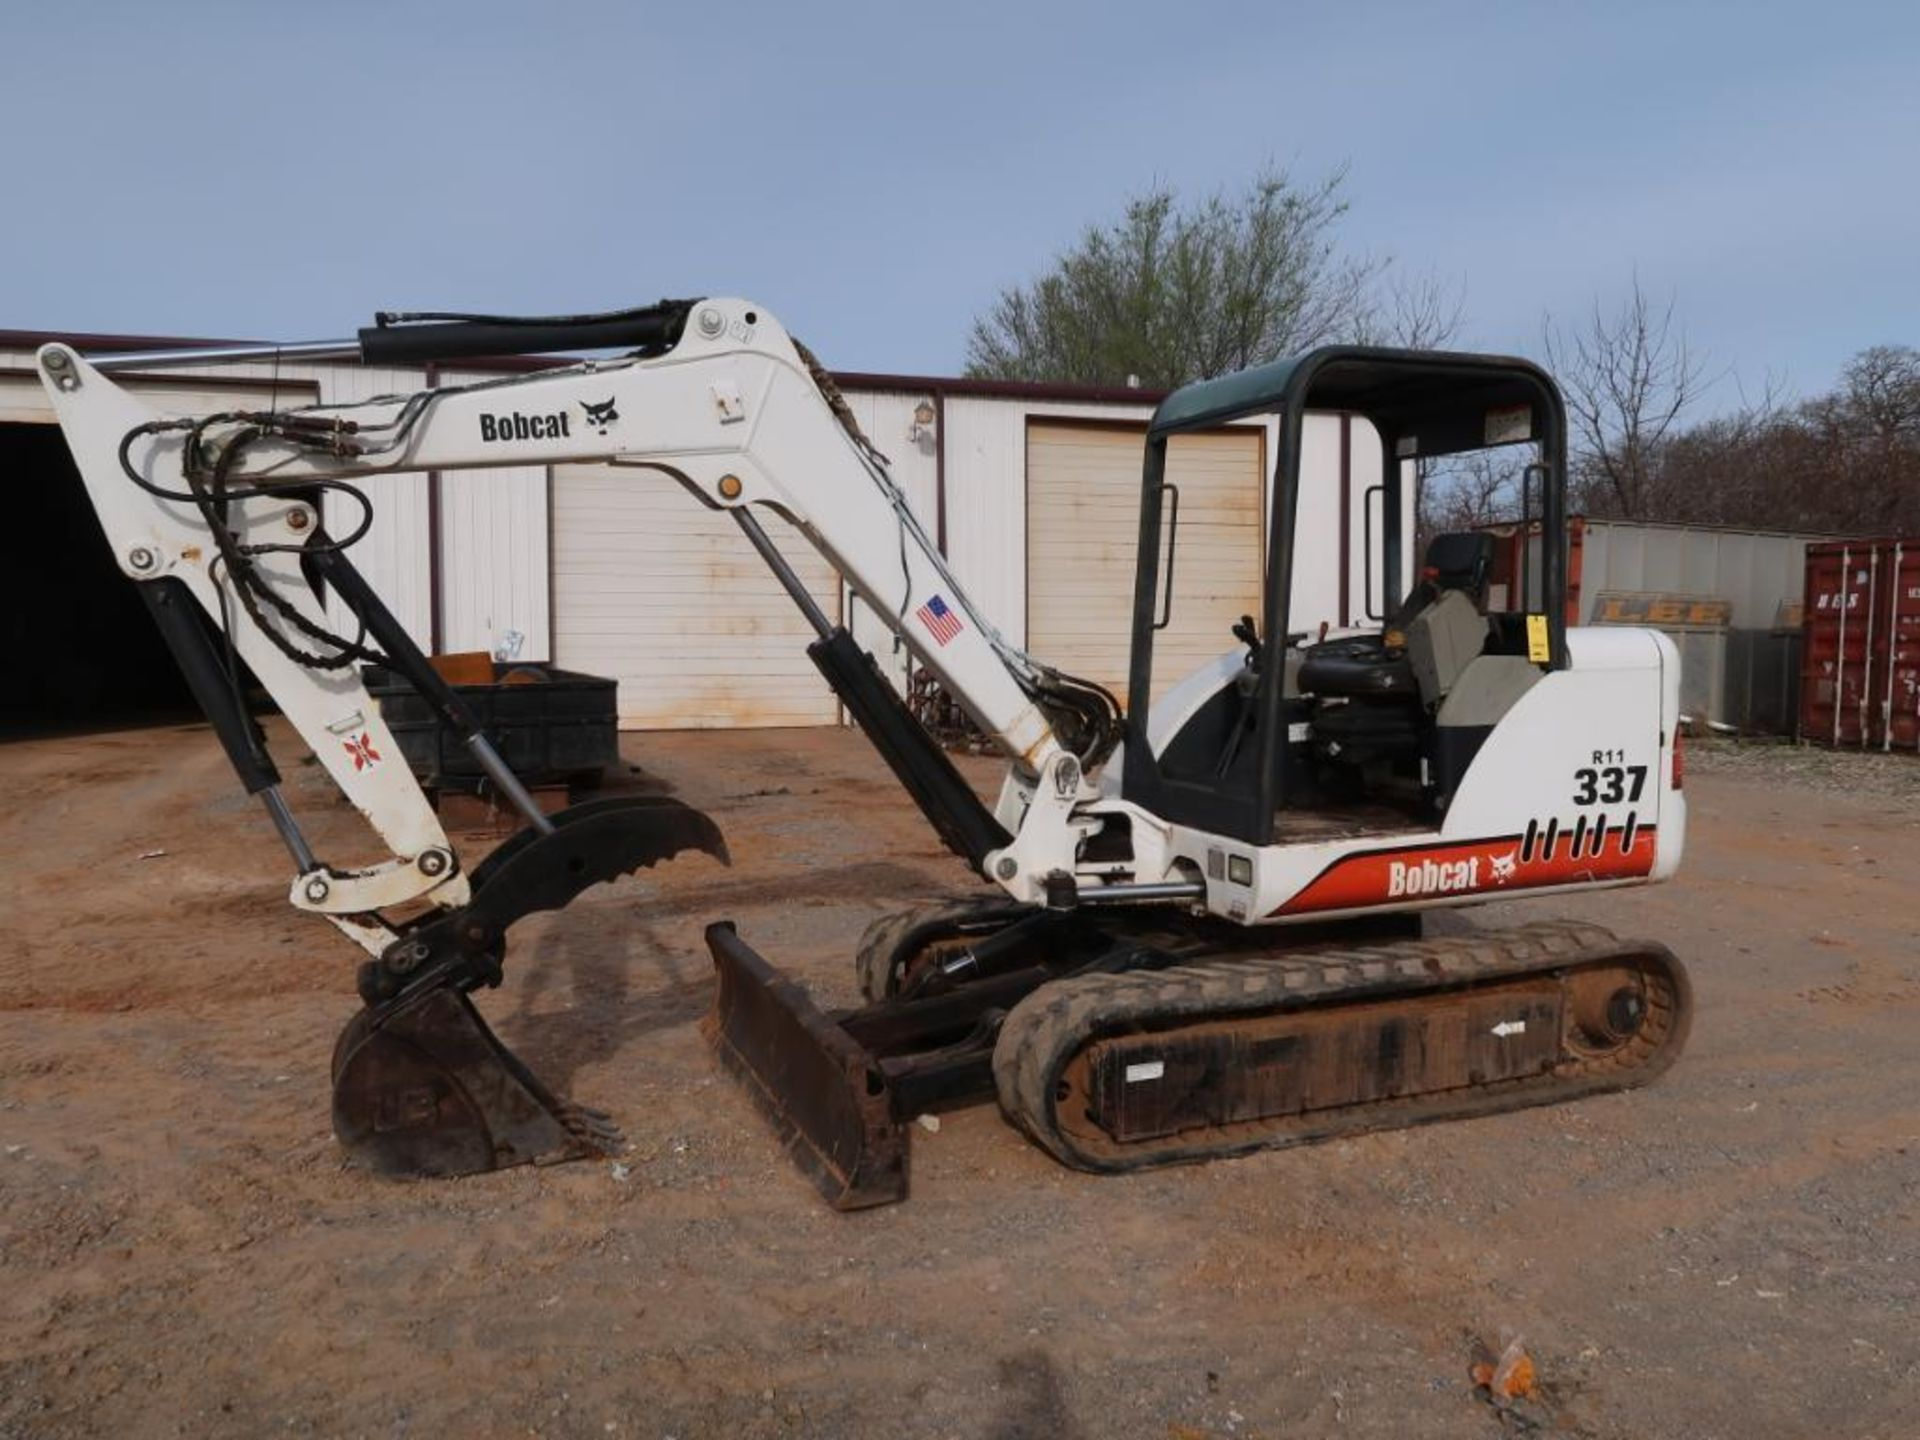 Lot 110 - 2001 Bobcat Model 377-D, Mini Excavator, Diesel, Hydraulic Thumb, 16 in. Bucket, S/N 233311416, 5860